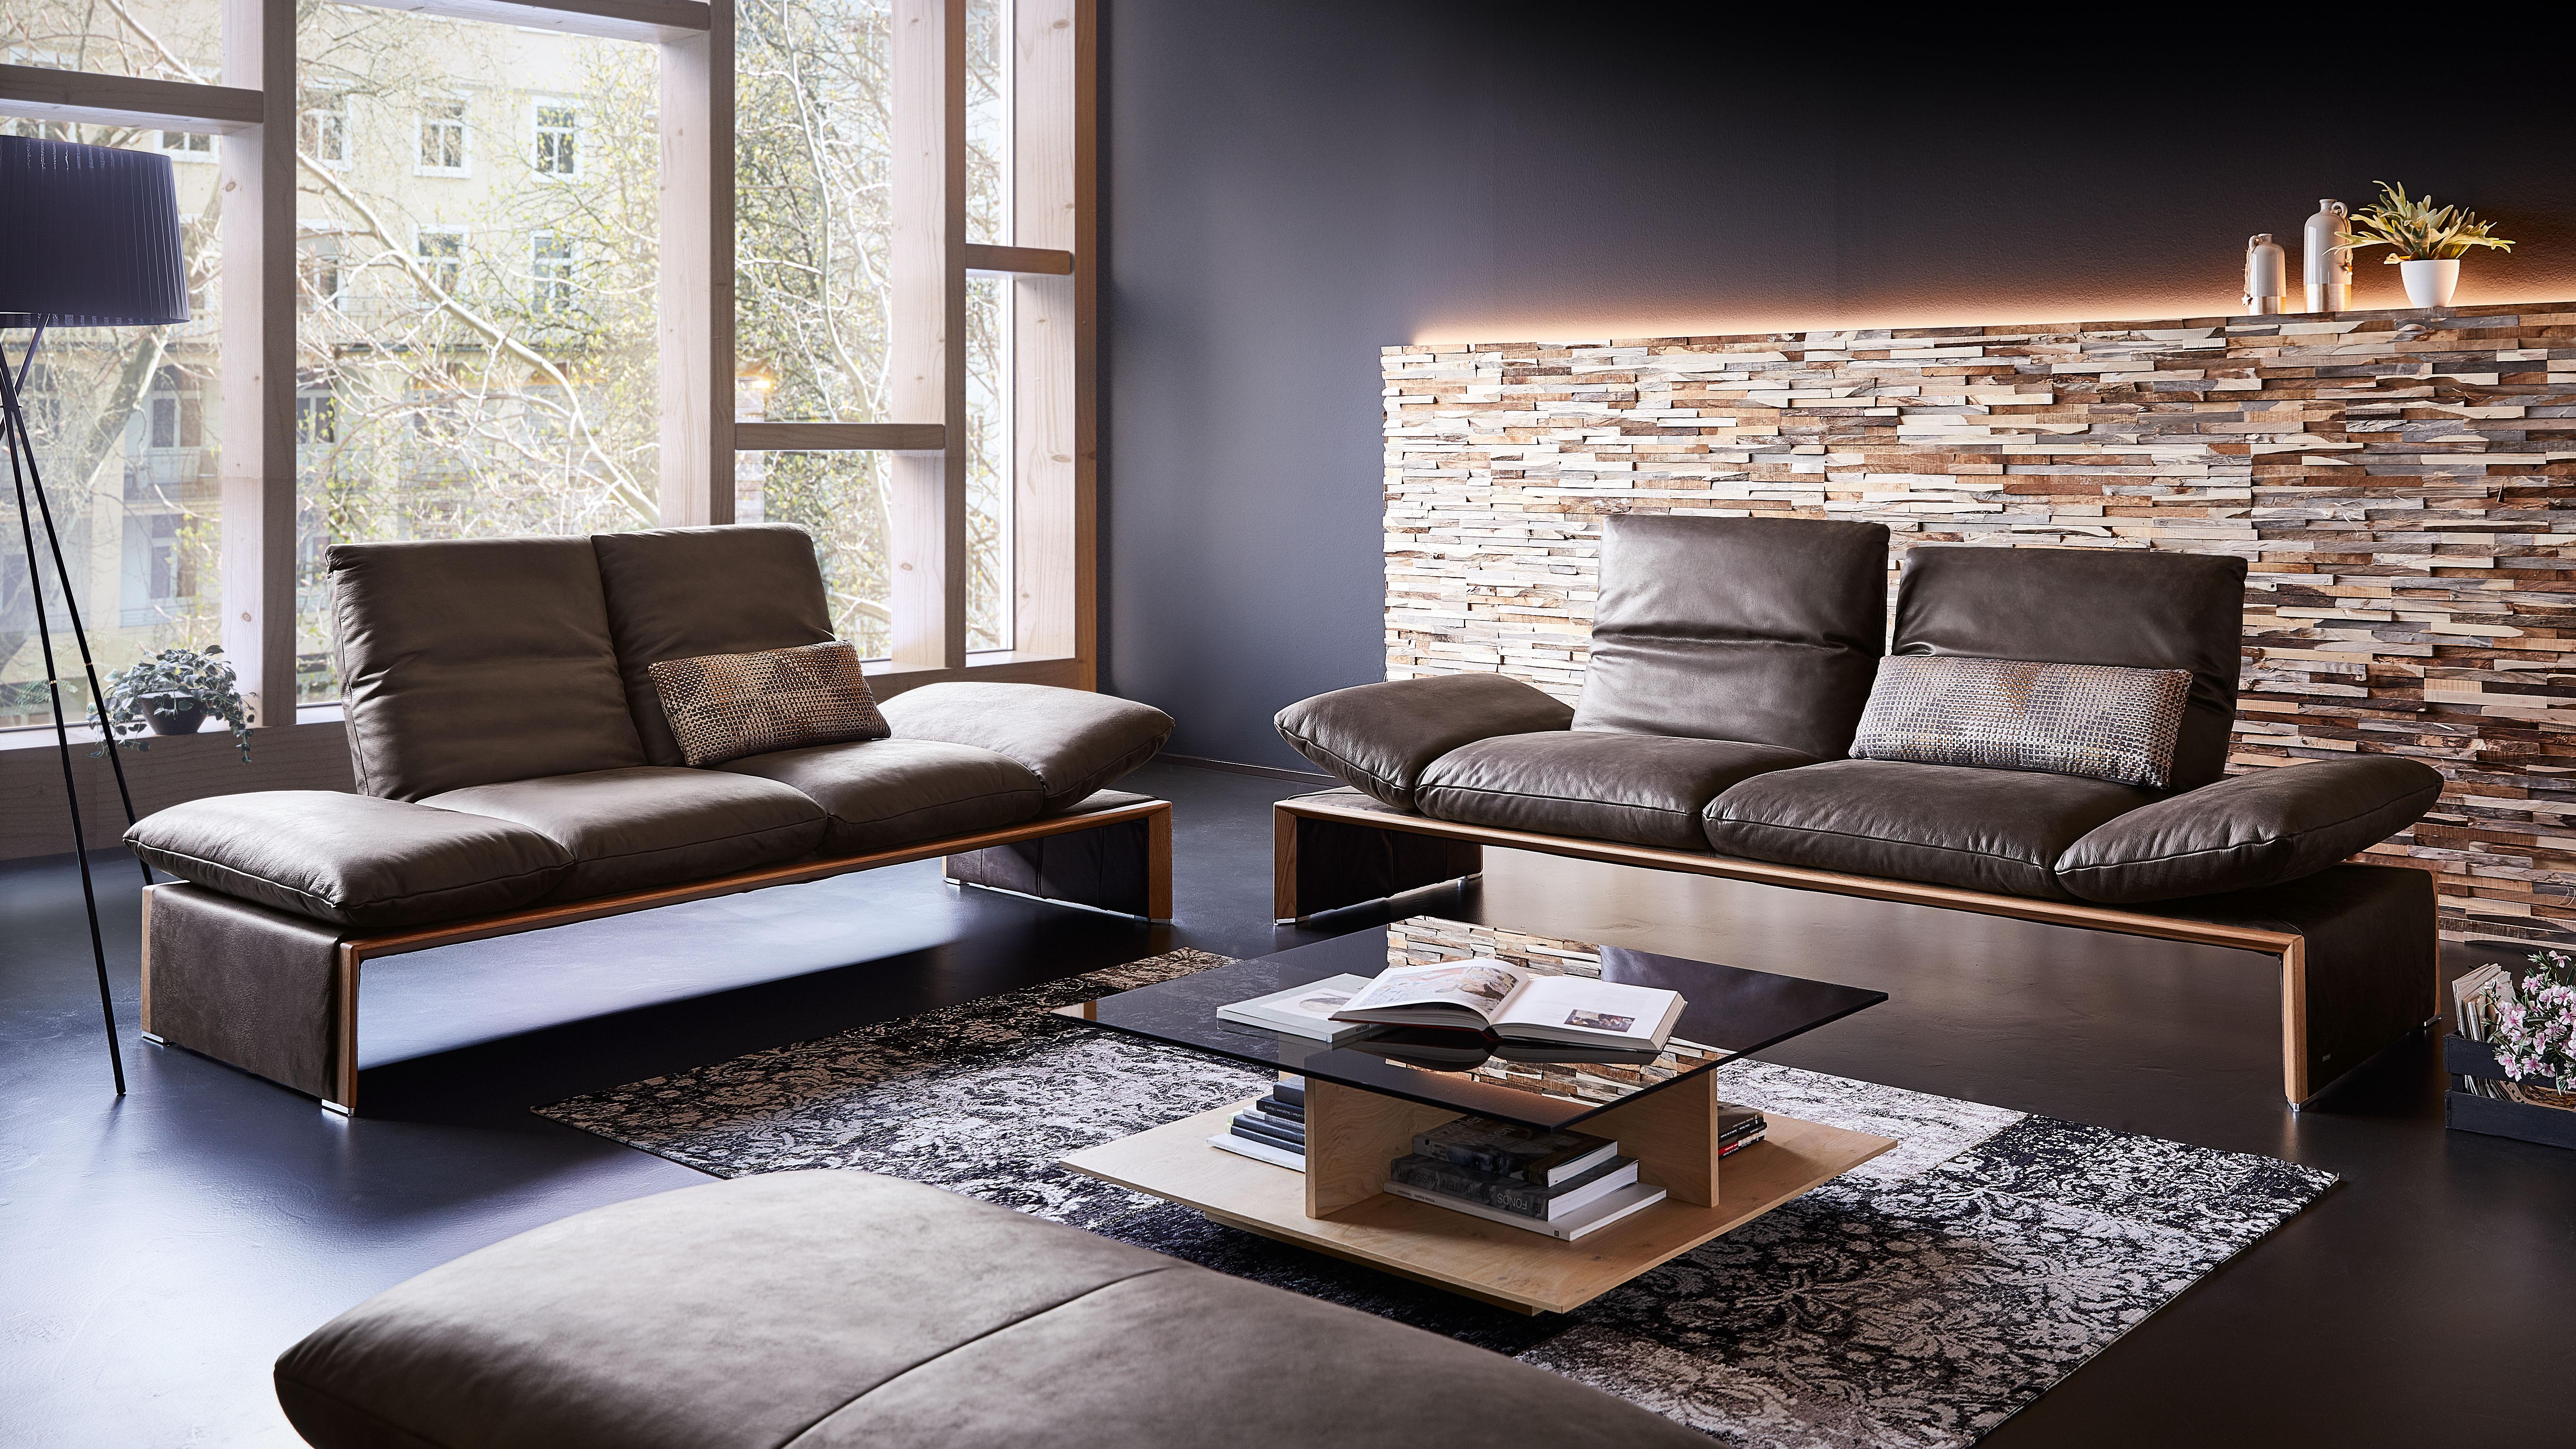 Koinor Couches I Love This Set So Different Corner Sofa Models Sofa Design Classic Sofa Designs